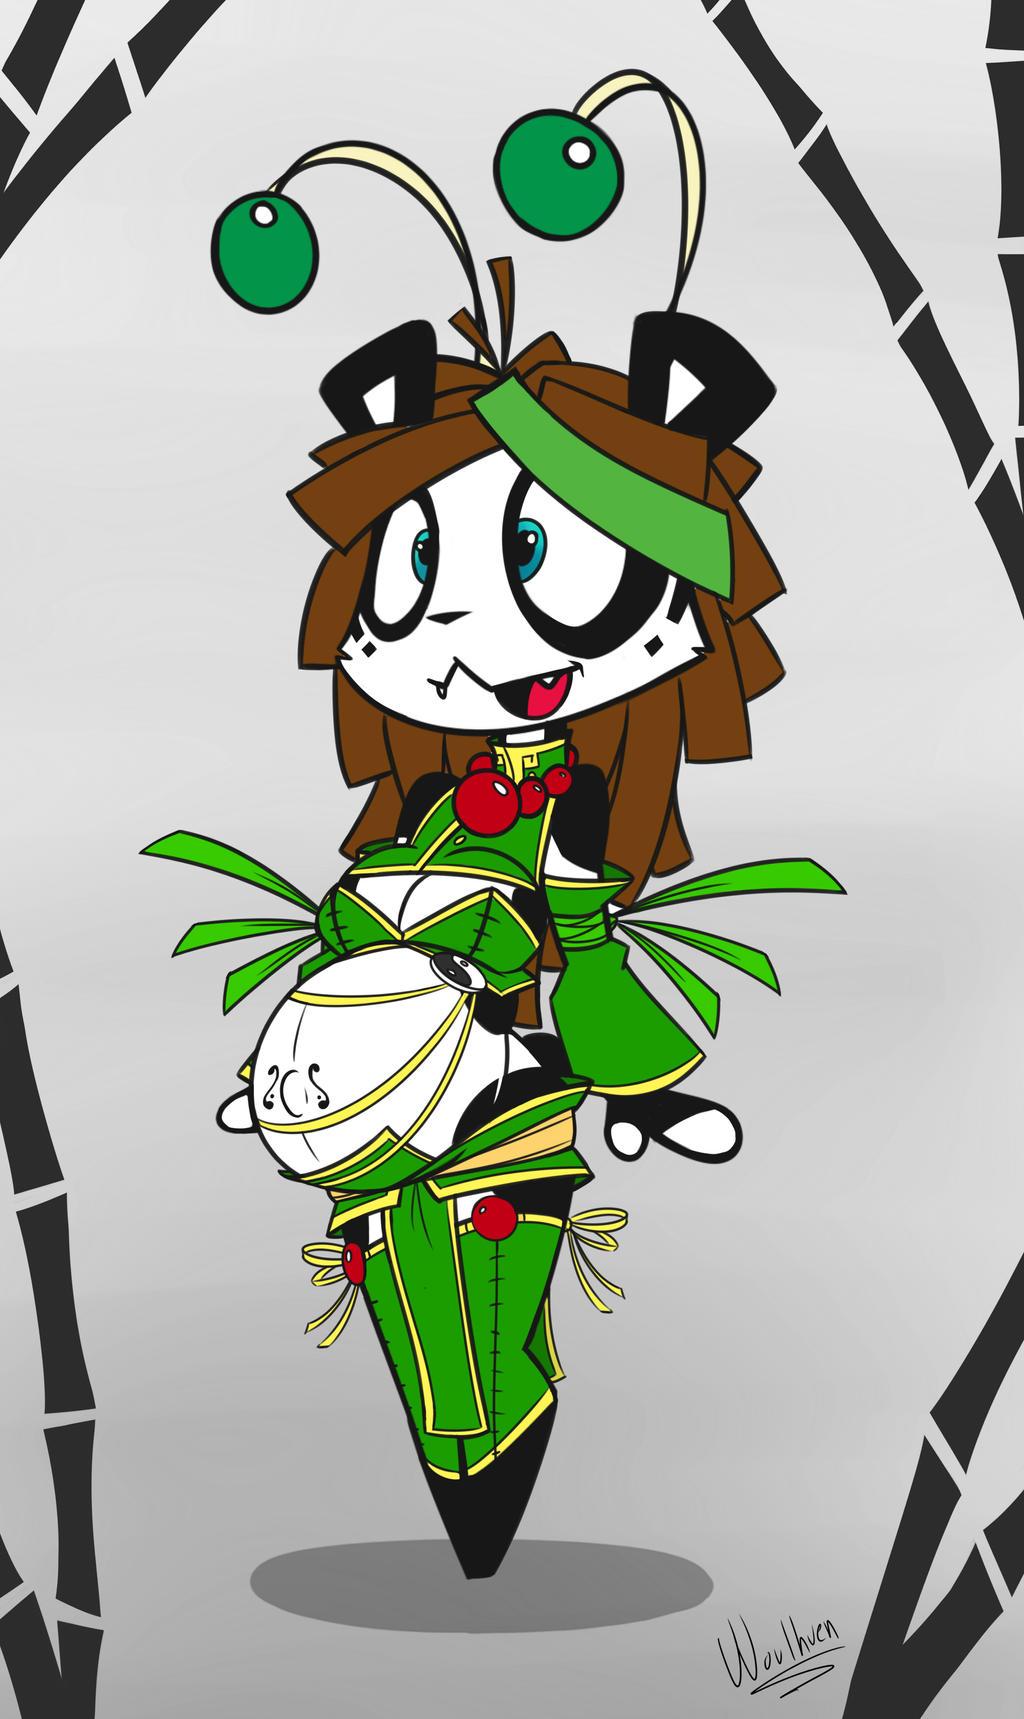 [Chibi Panda] Lil' Spring Wo by Wouhlven